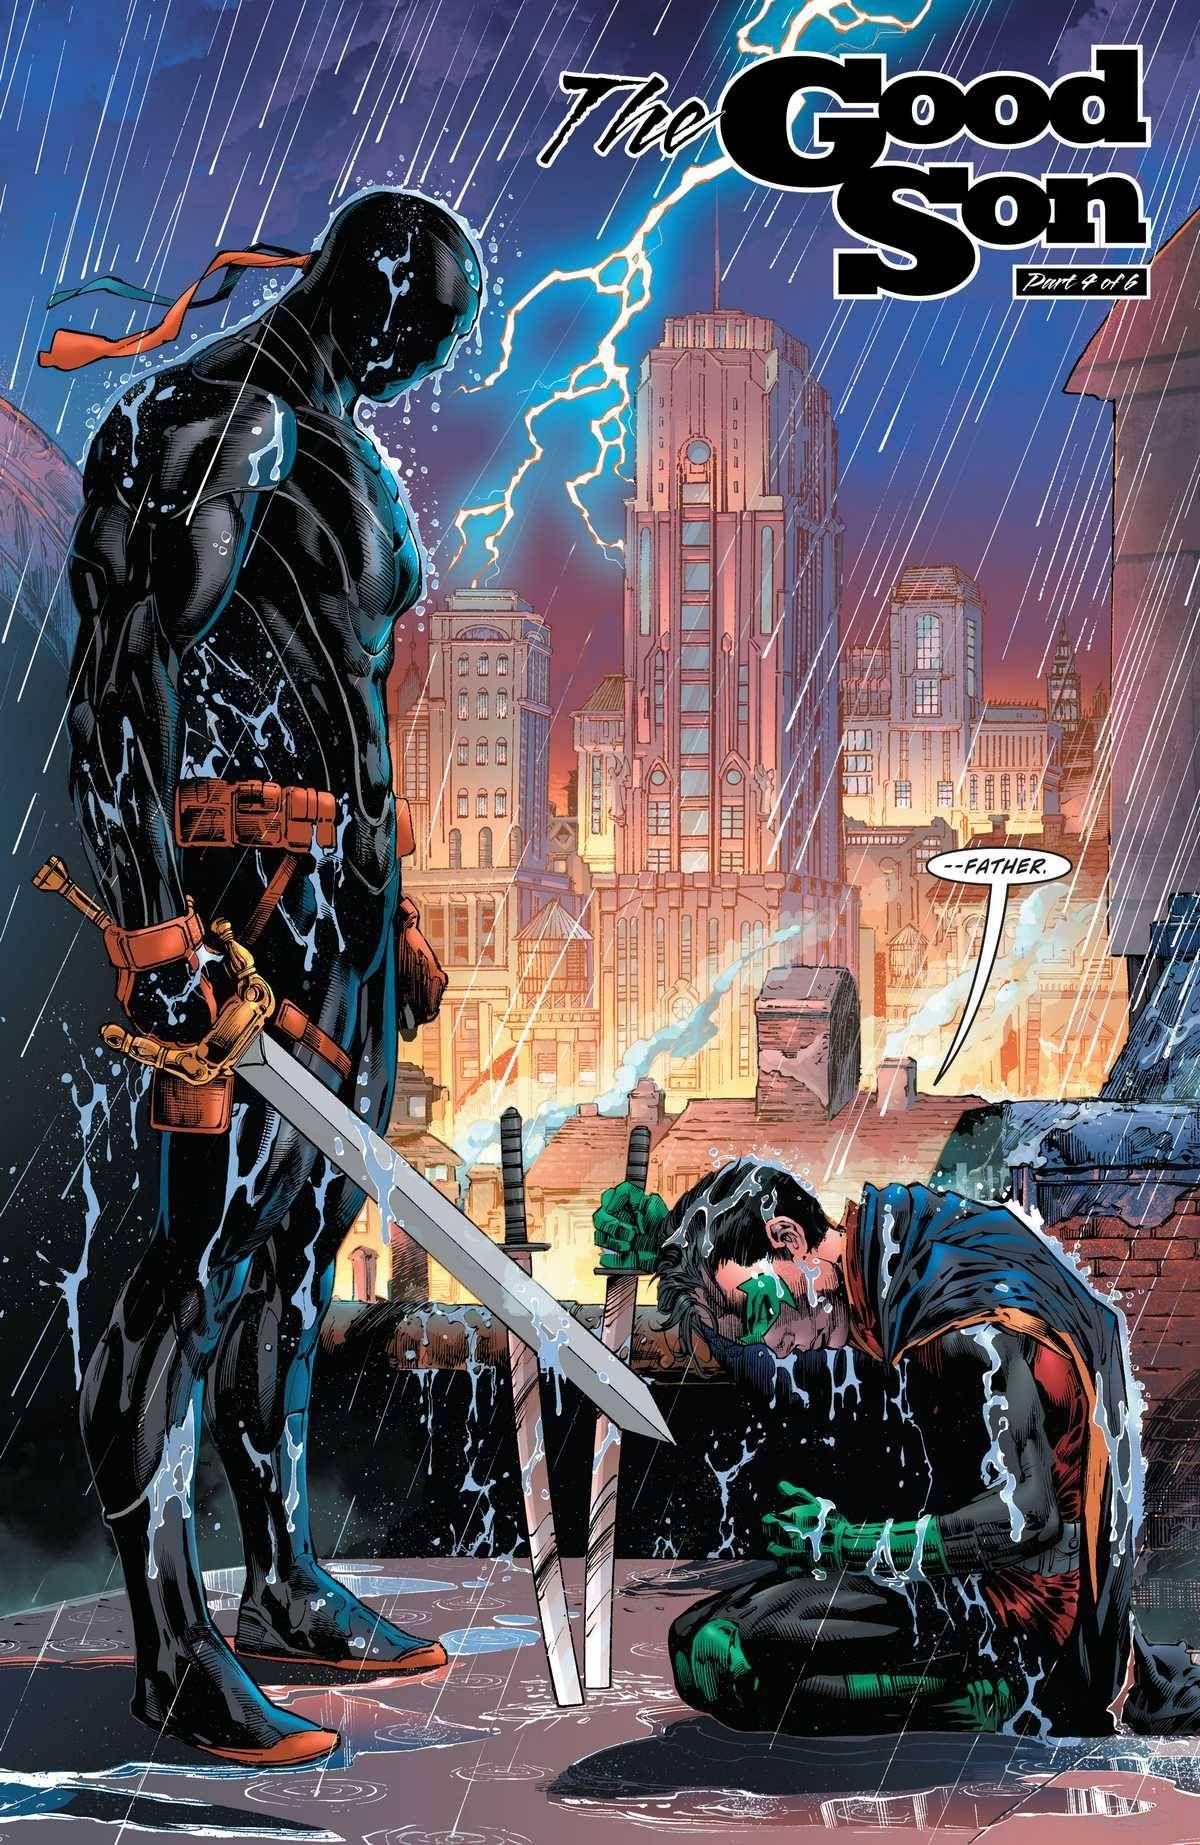 New Comic Book Art! | Comics | Dc comics poster, Comic books, Comic